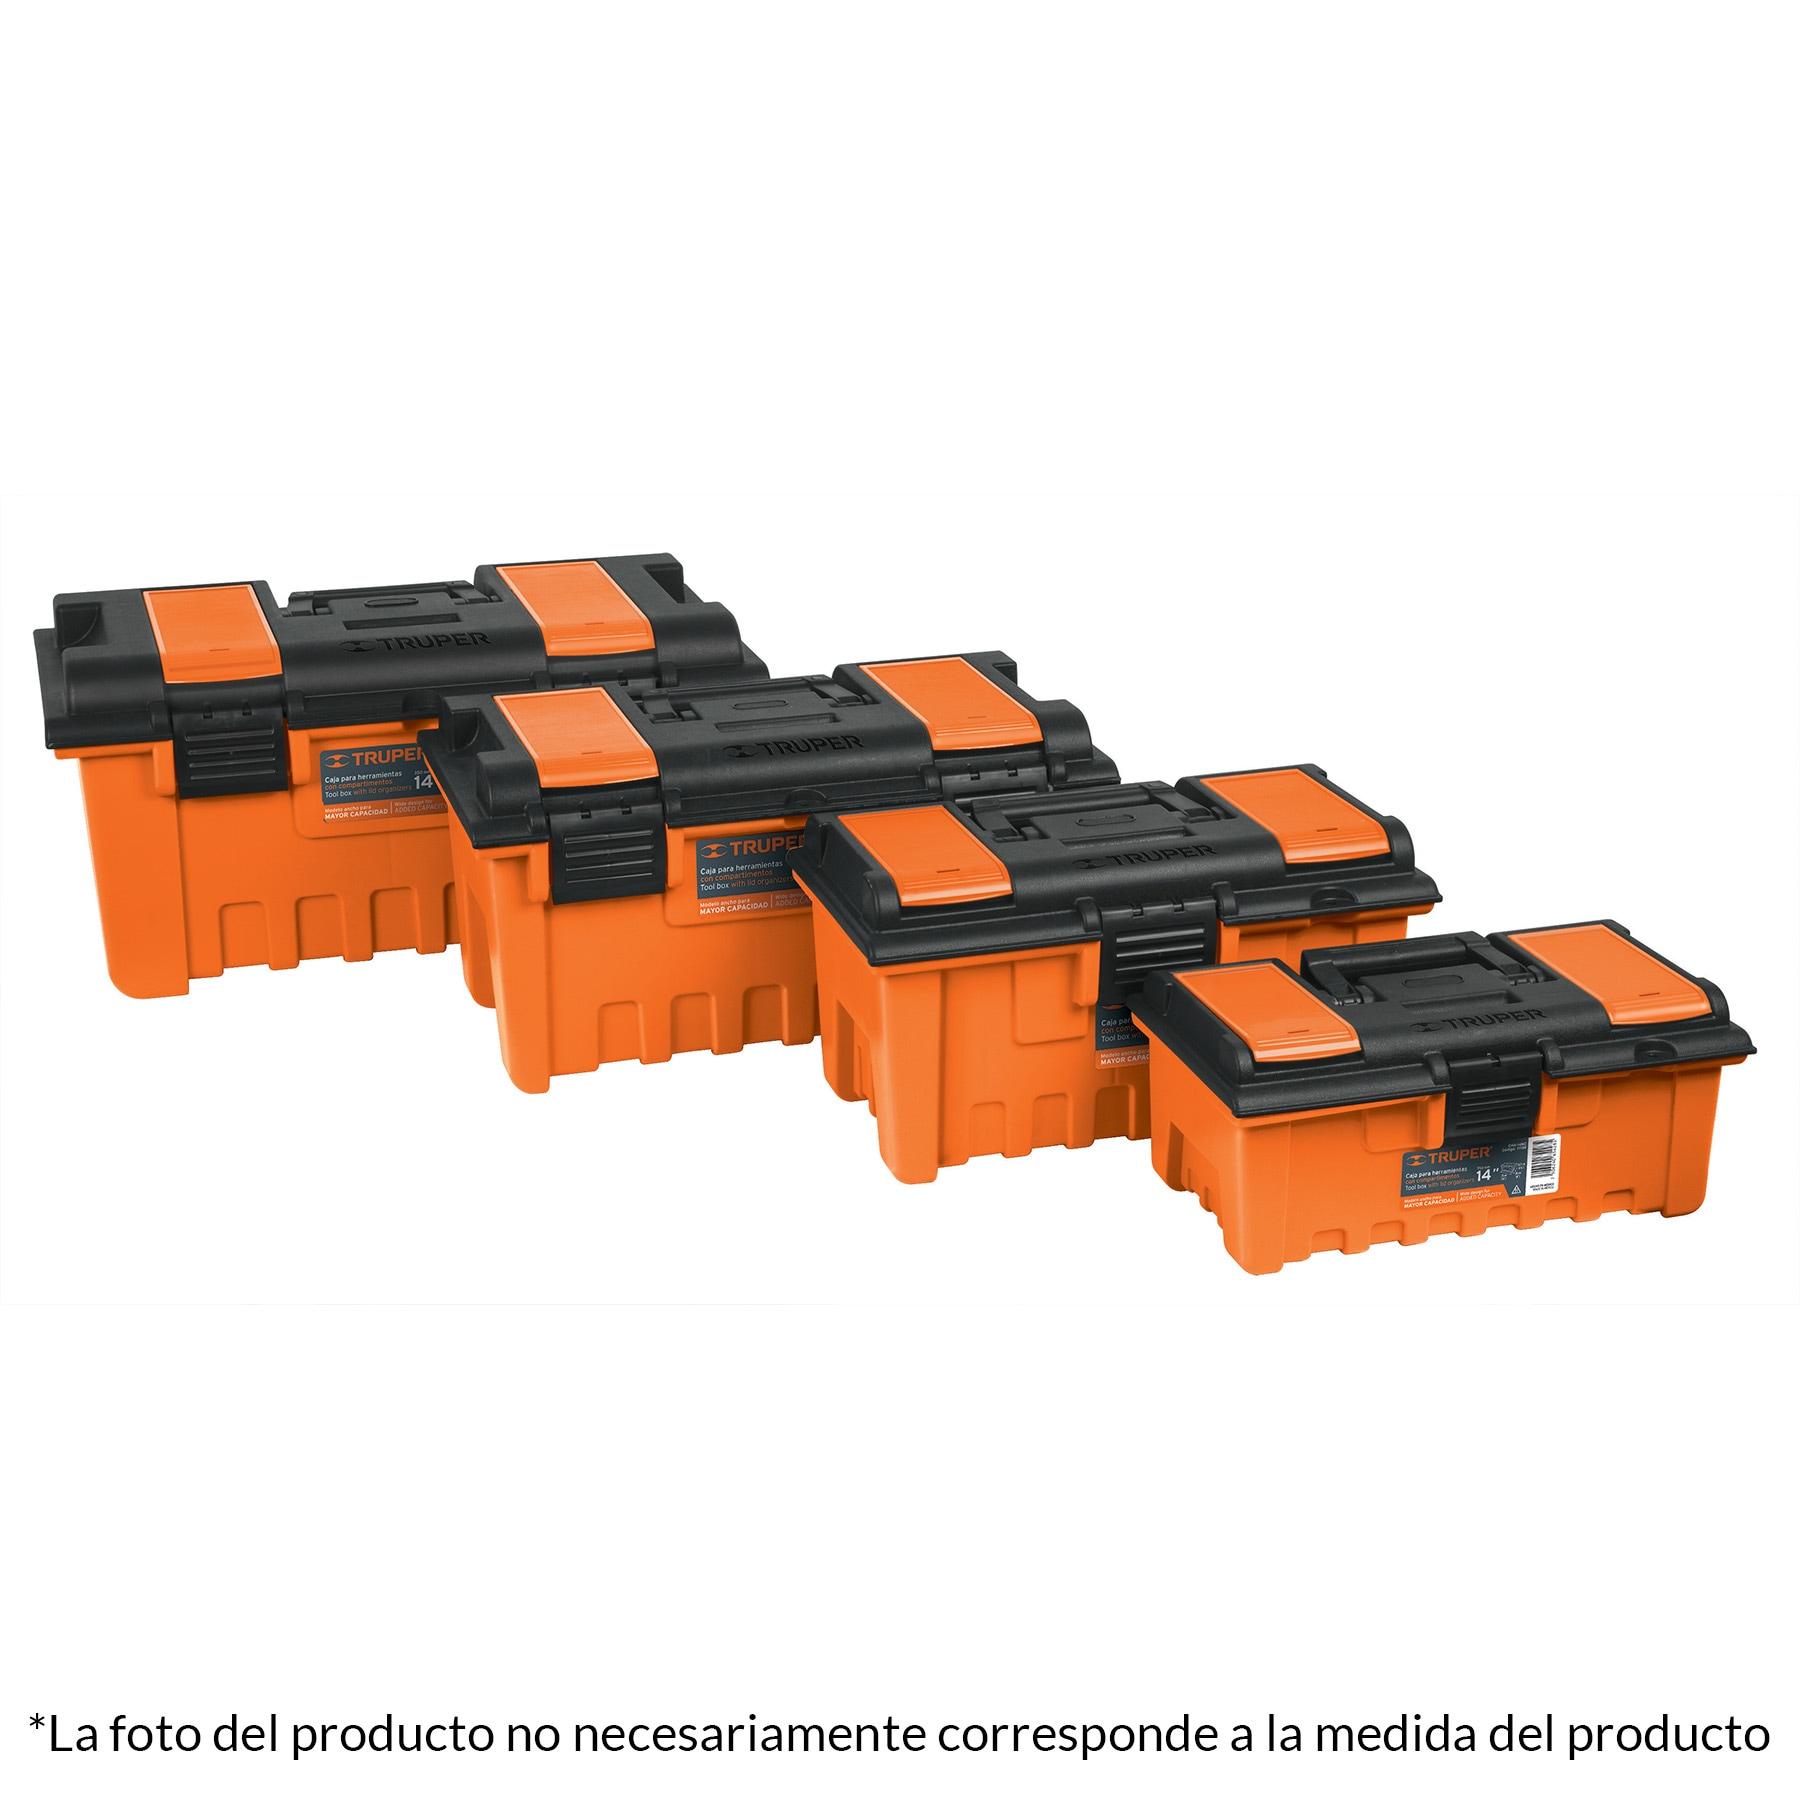 Caja plástica 19' con compartimentos, naranja